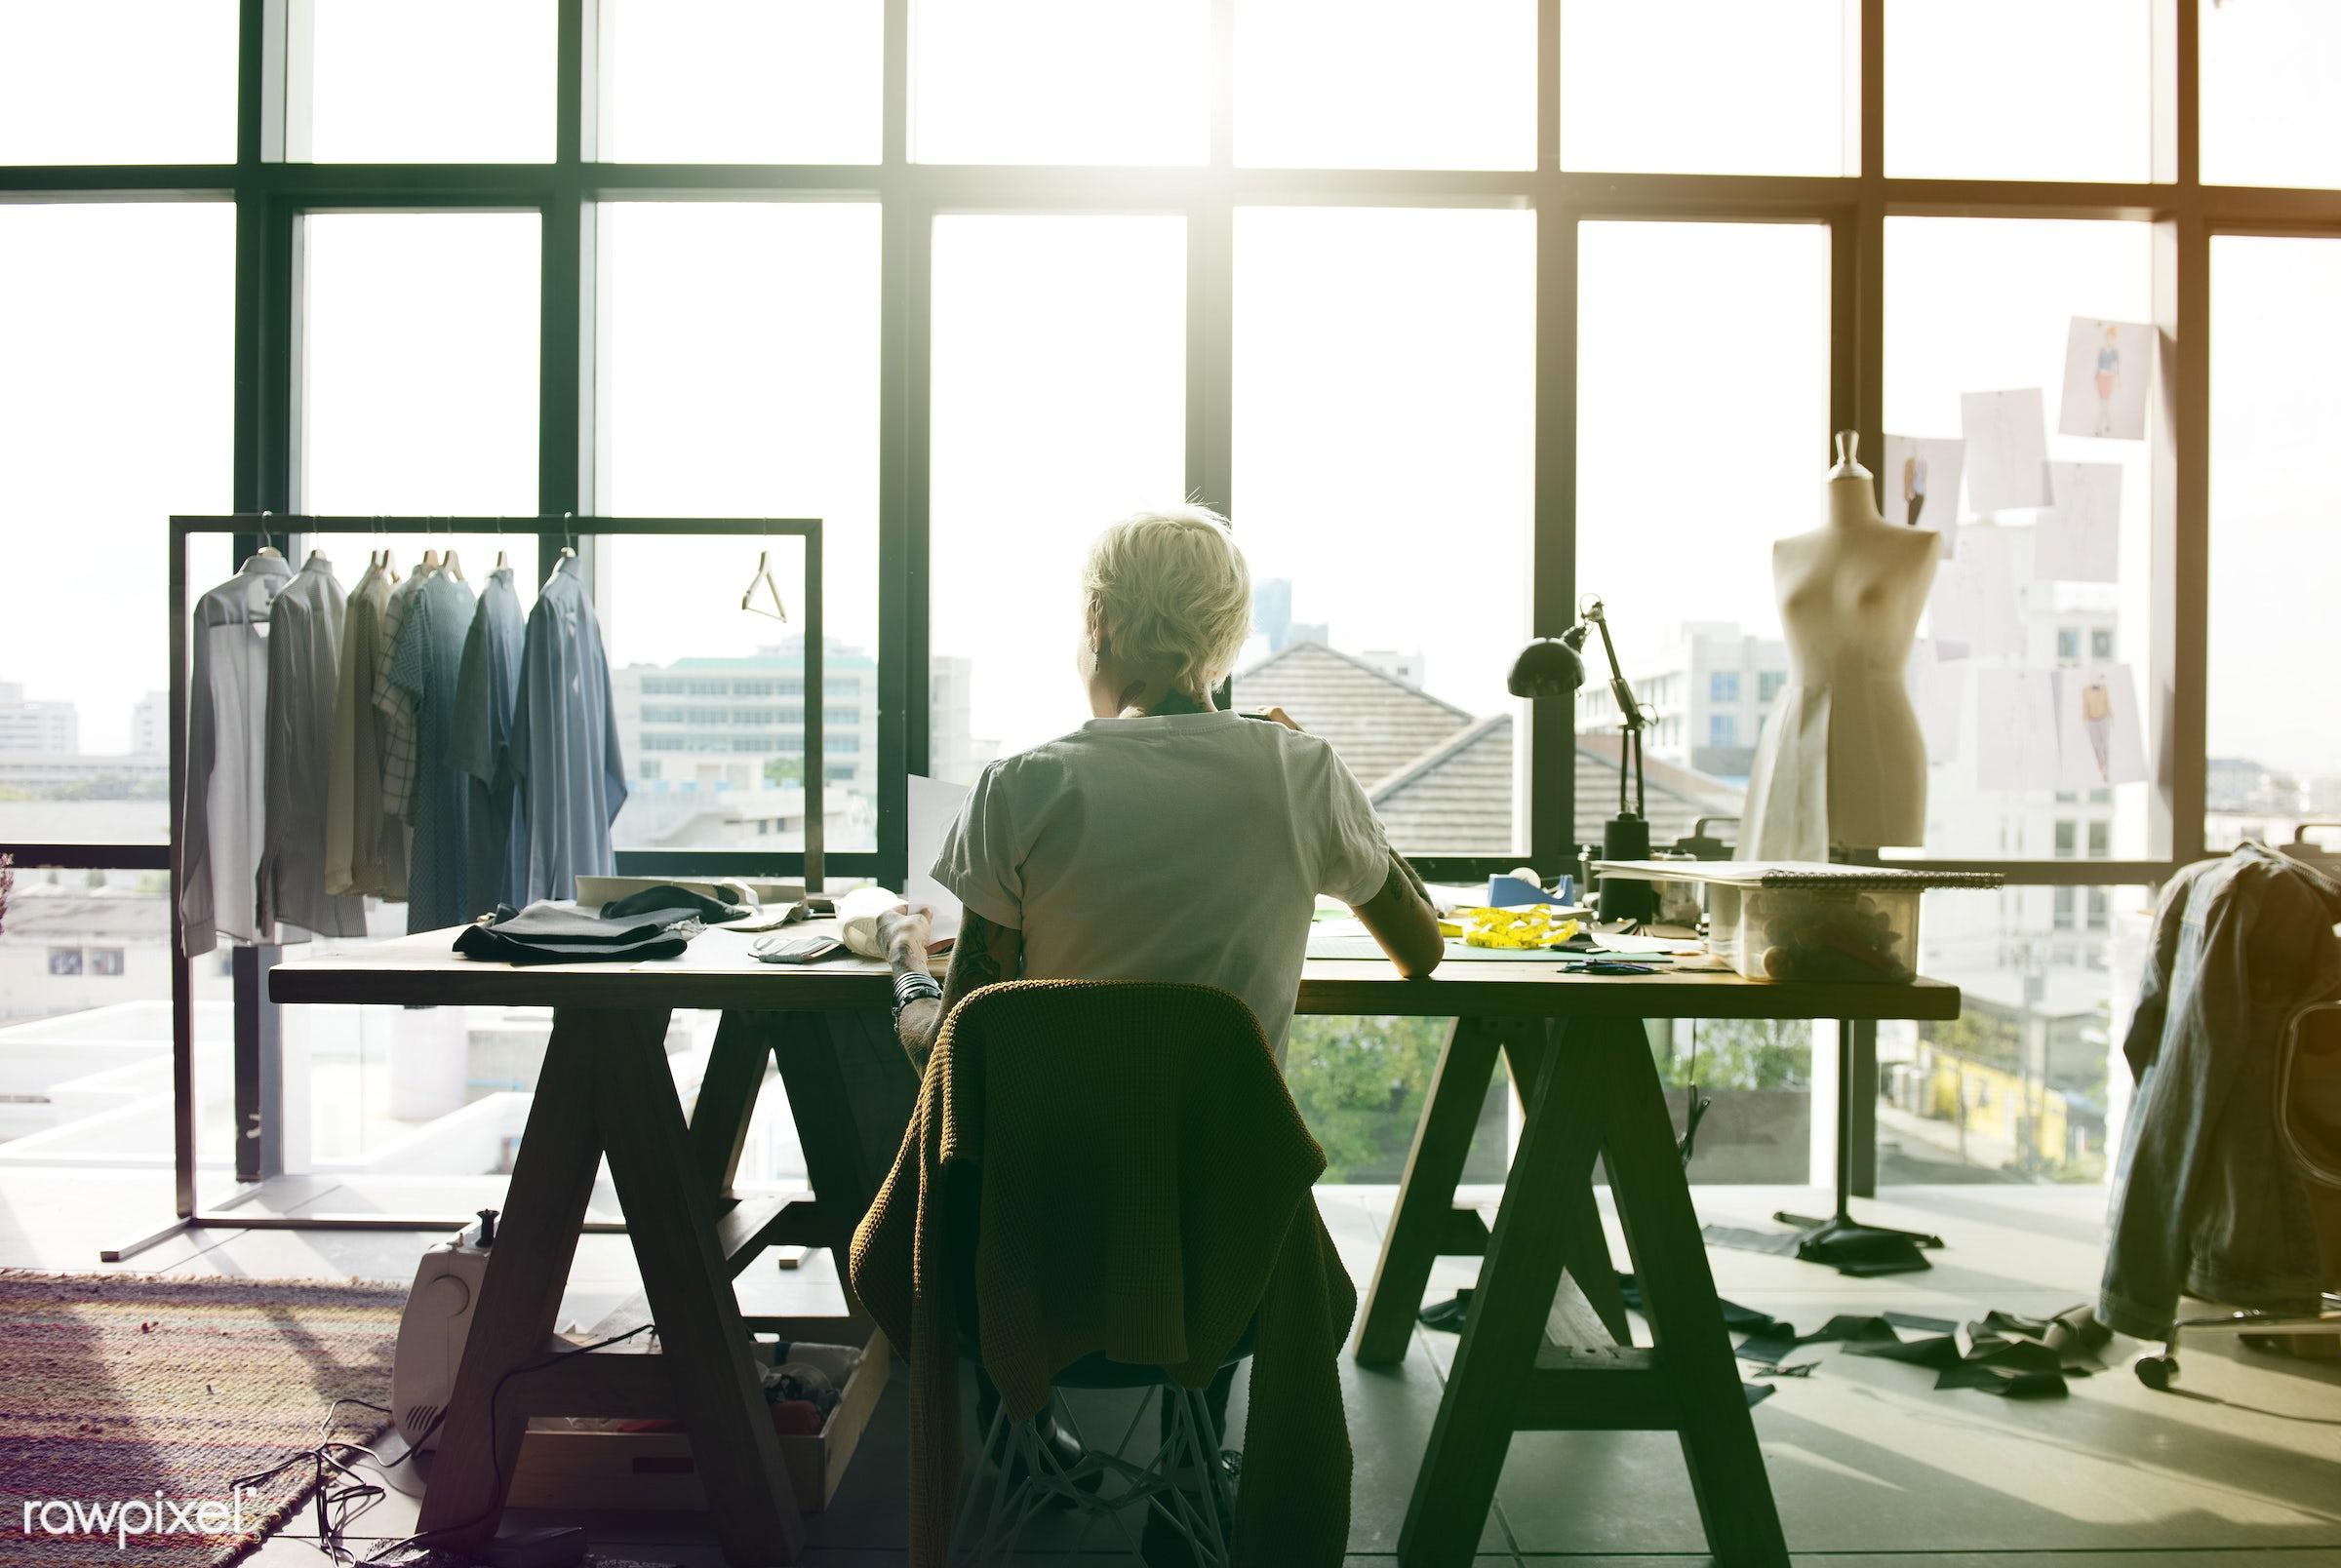 analyzing, new ideas, profession, inspiration, designers, brainstorm, focus, occupation, creative, brainstorming, job,...